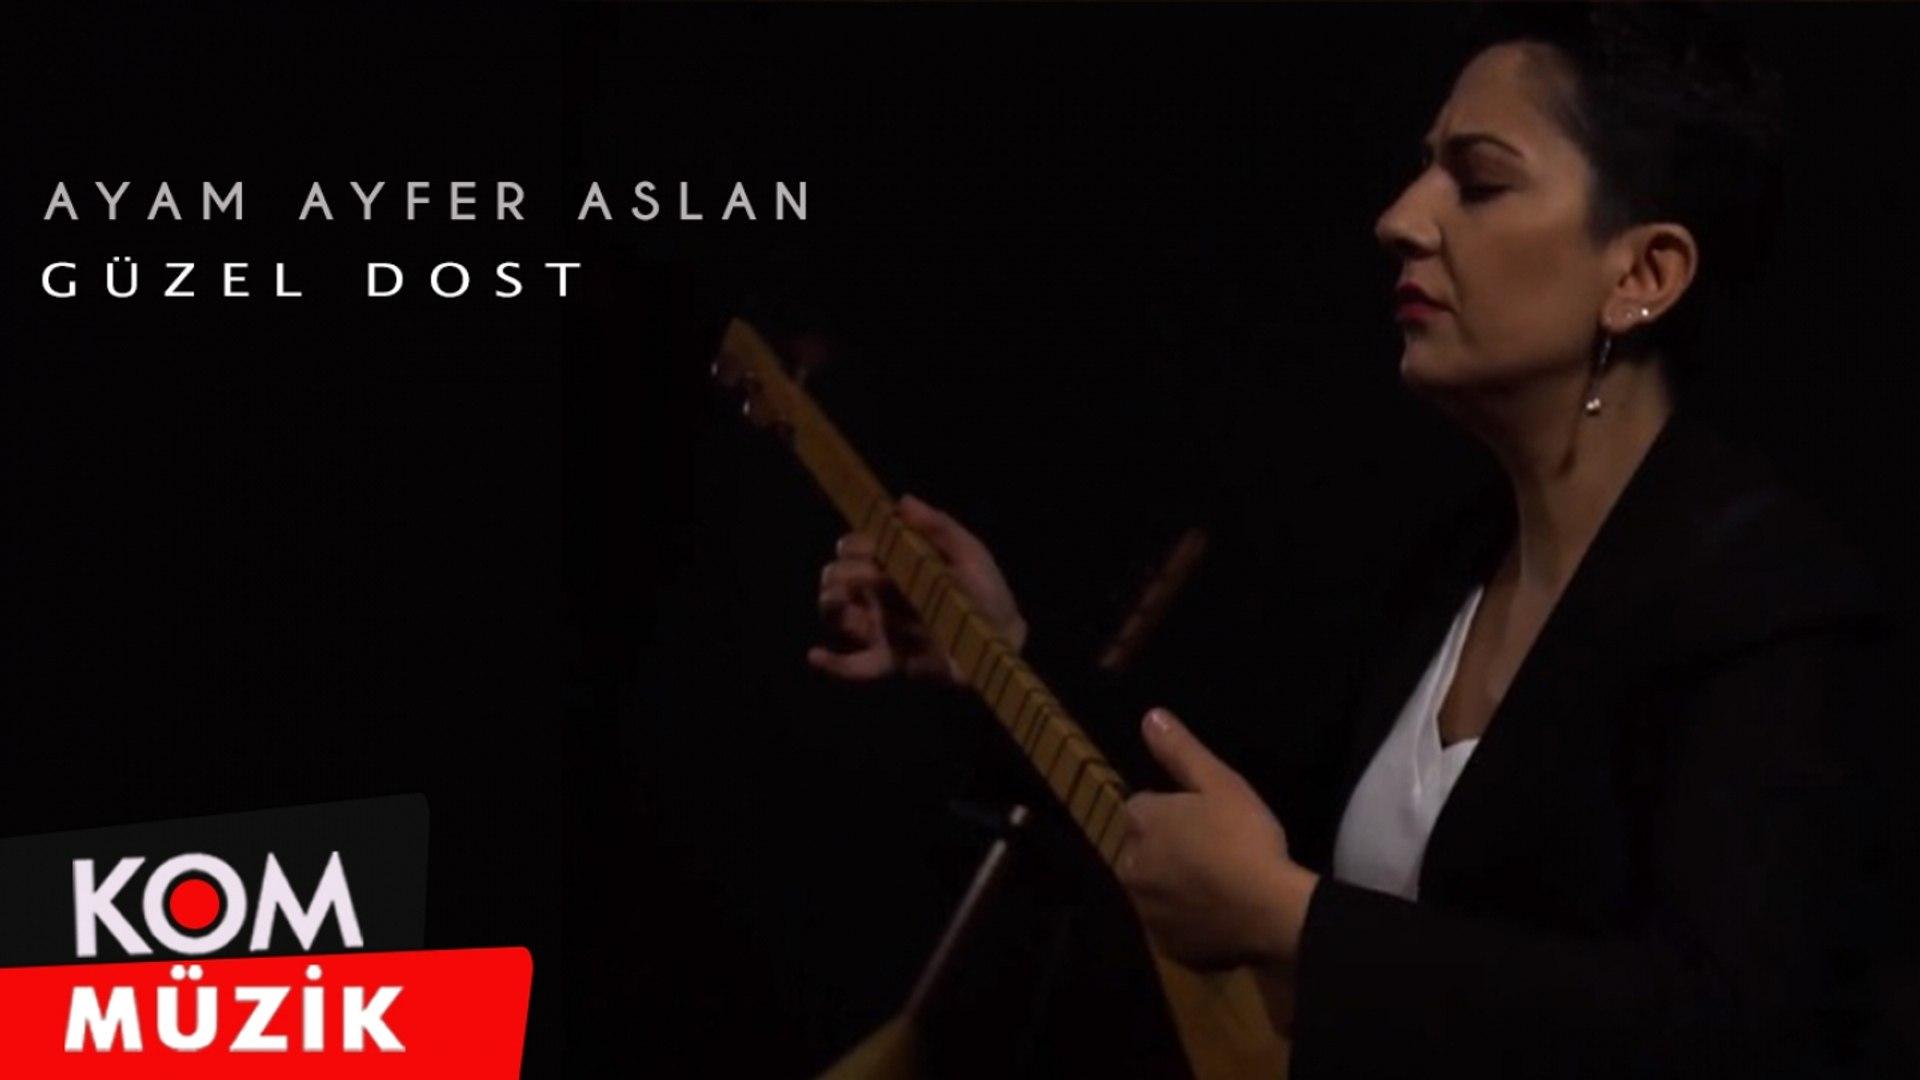 Ayam Ayfer Aslan - Güzel Dost (2020 © Kom Müzik)